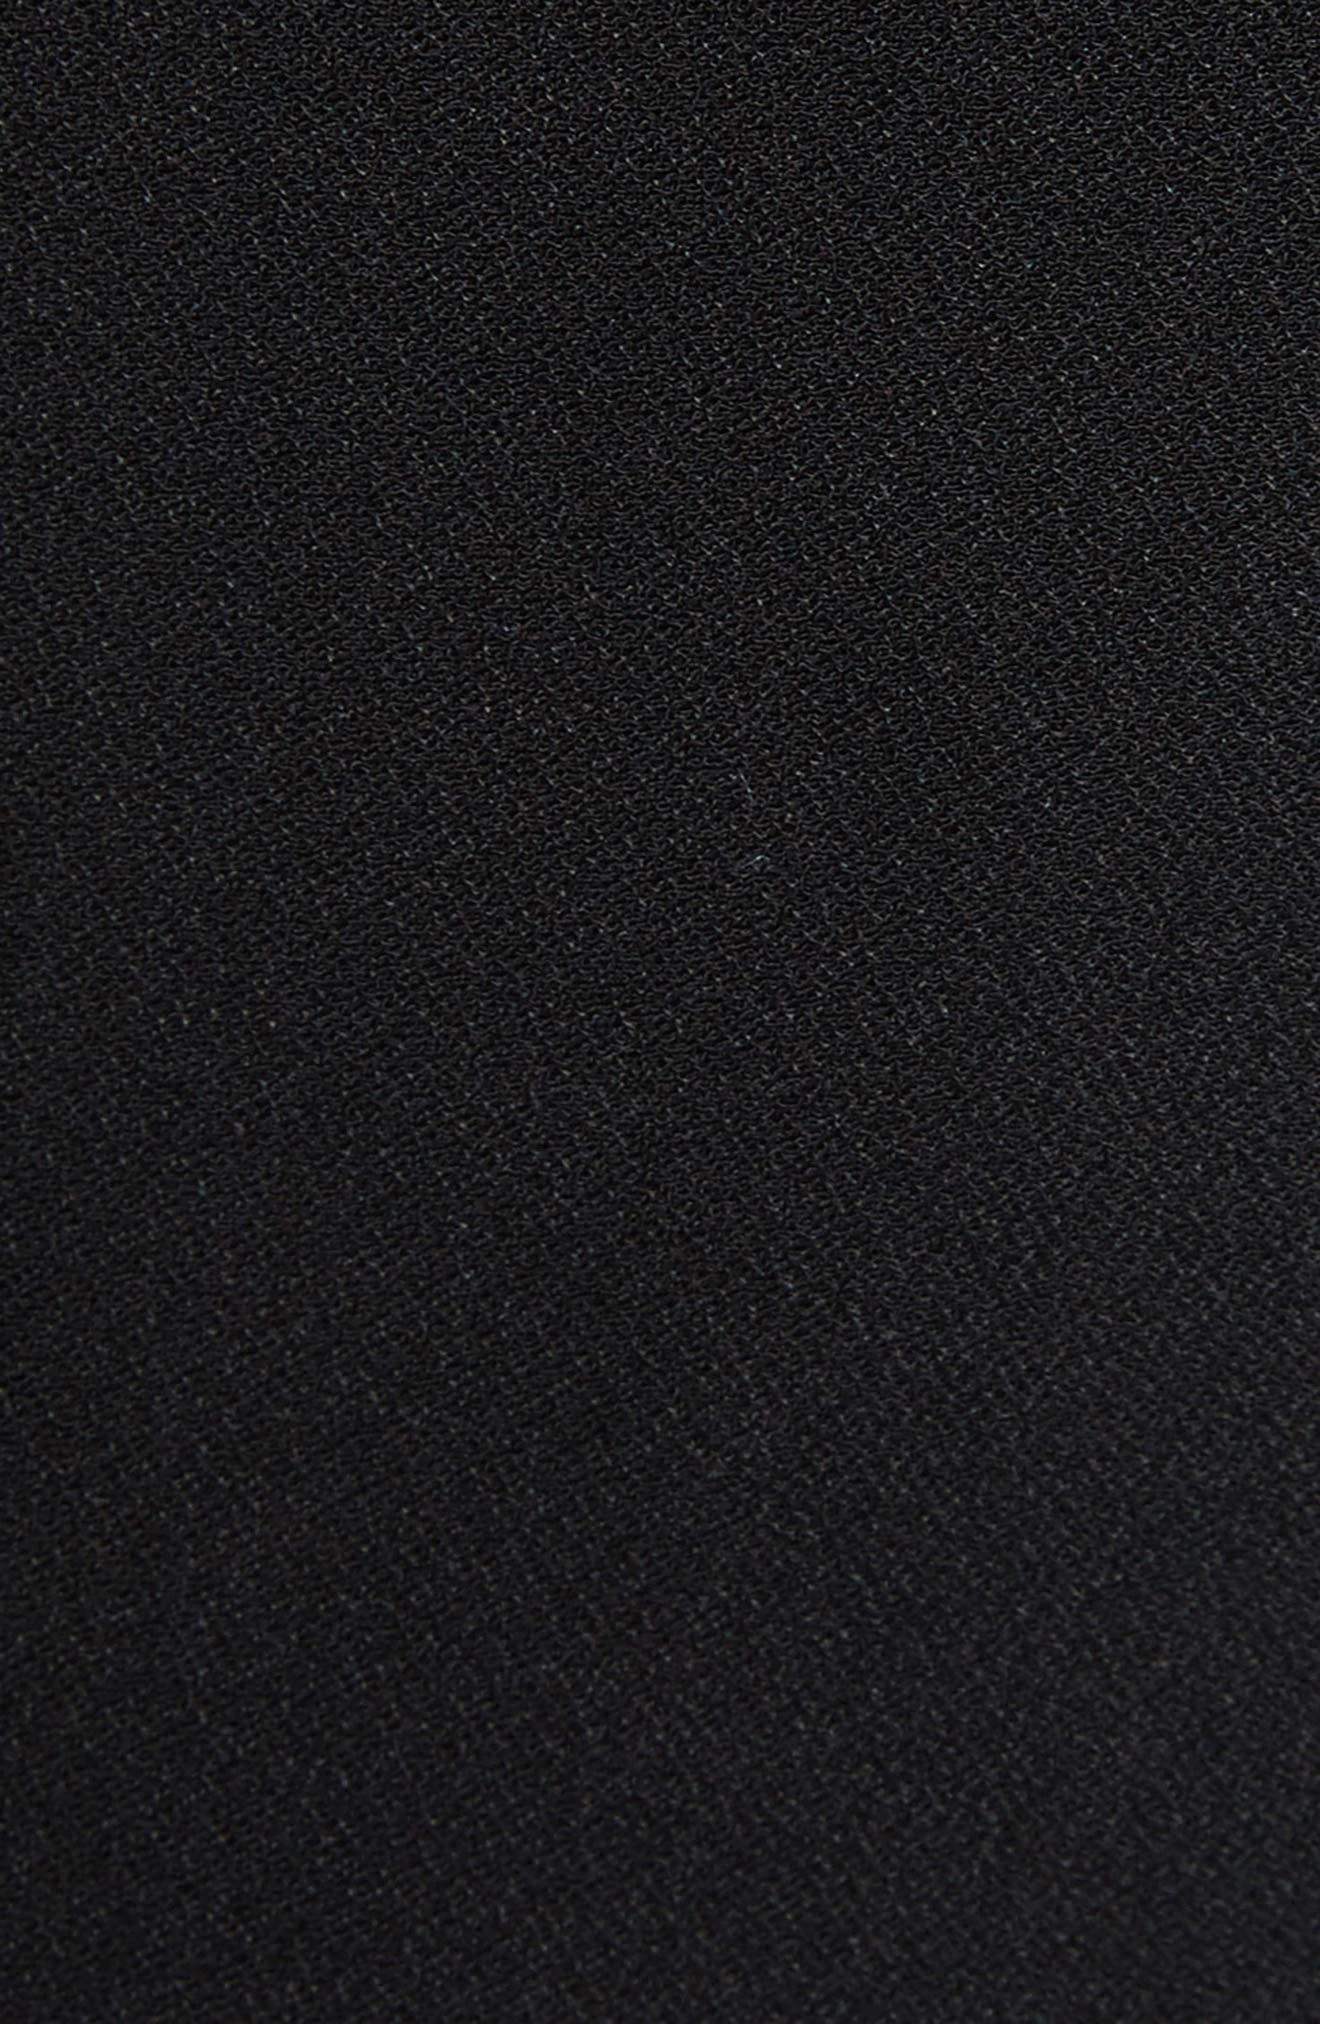 Pana One-Shoulder Peplum Sheath Dress,                             Alternate thumbnail 5, color,                             001